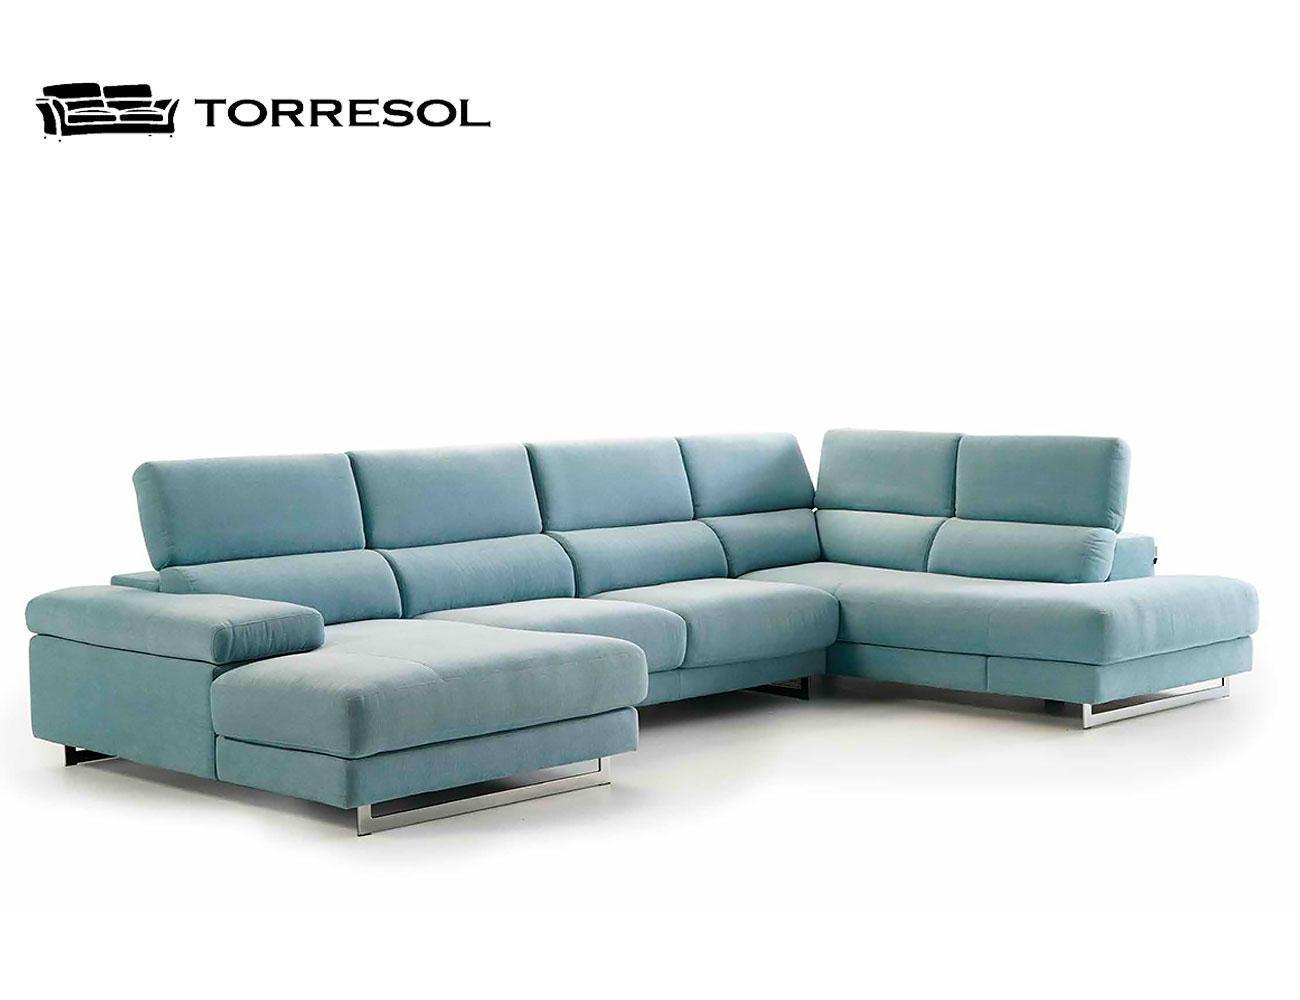 Sofa ace torresol rinconera